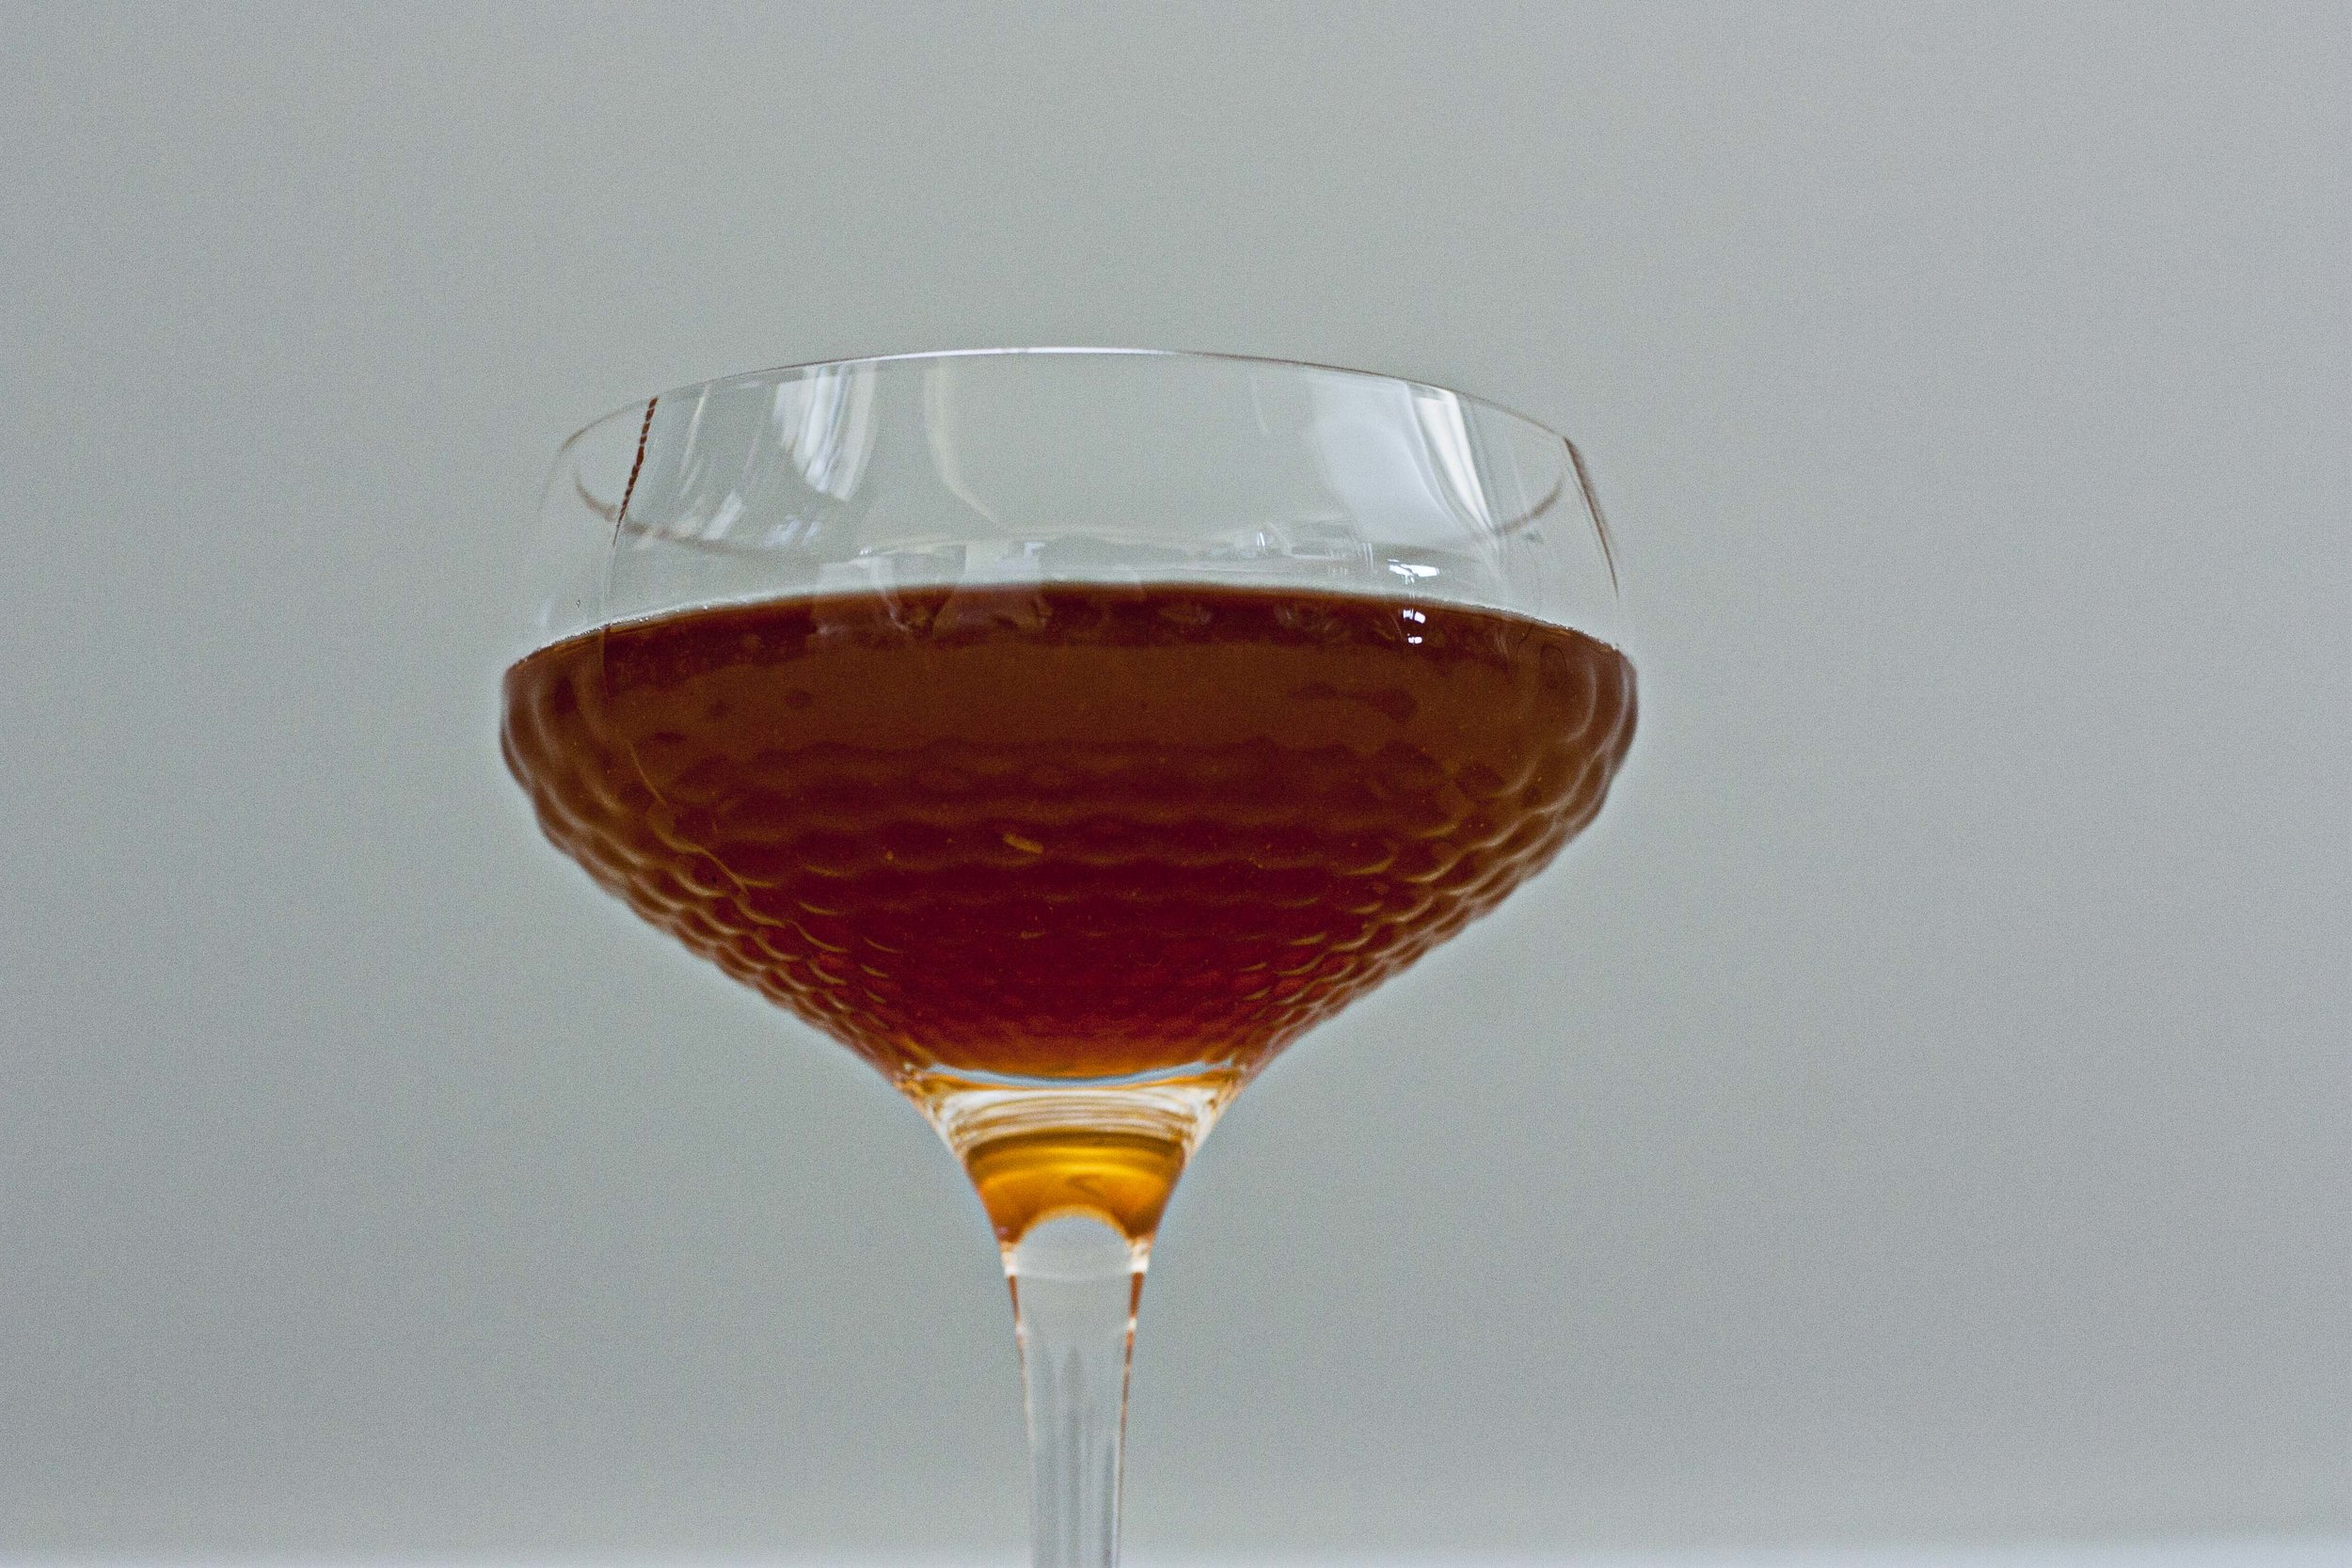 ScotchCocktail